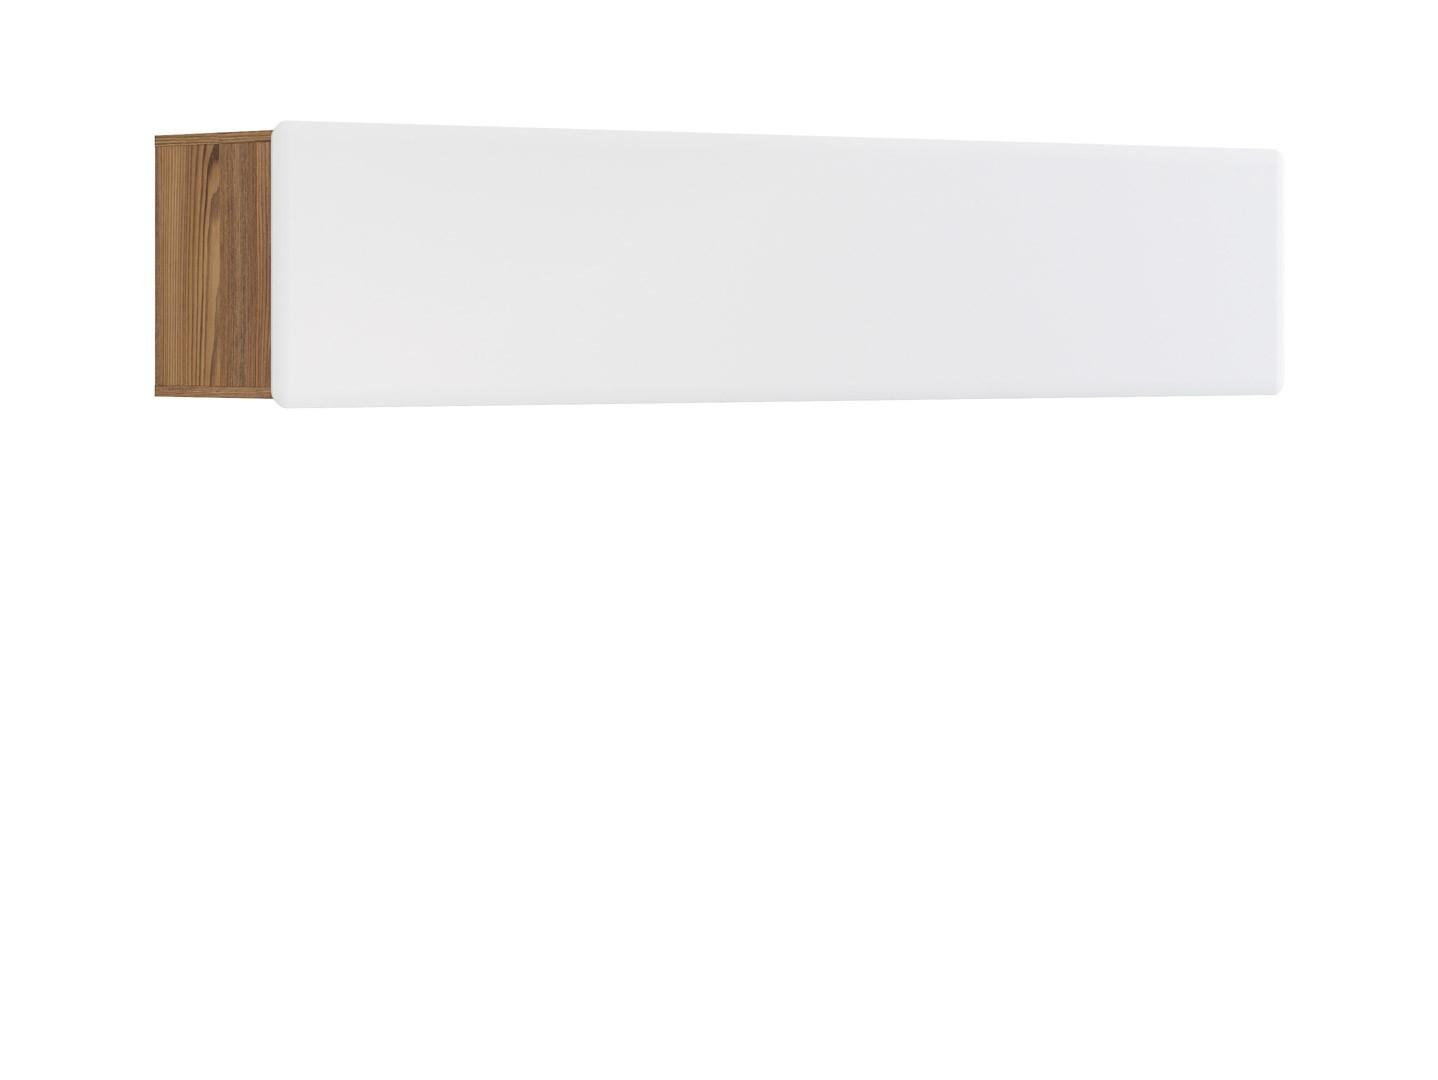 Polička - BRW - Possi Light SFW1K/4/20 (modřín sibiu zlatý + lesk bílý)